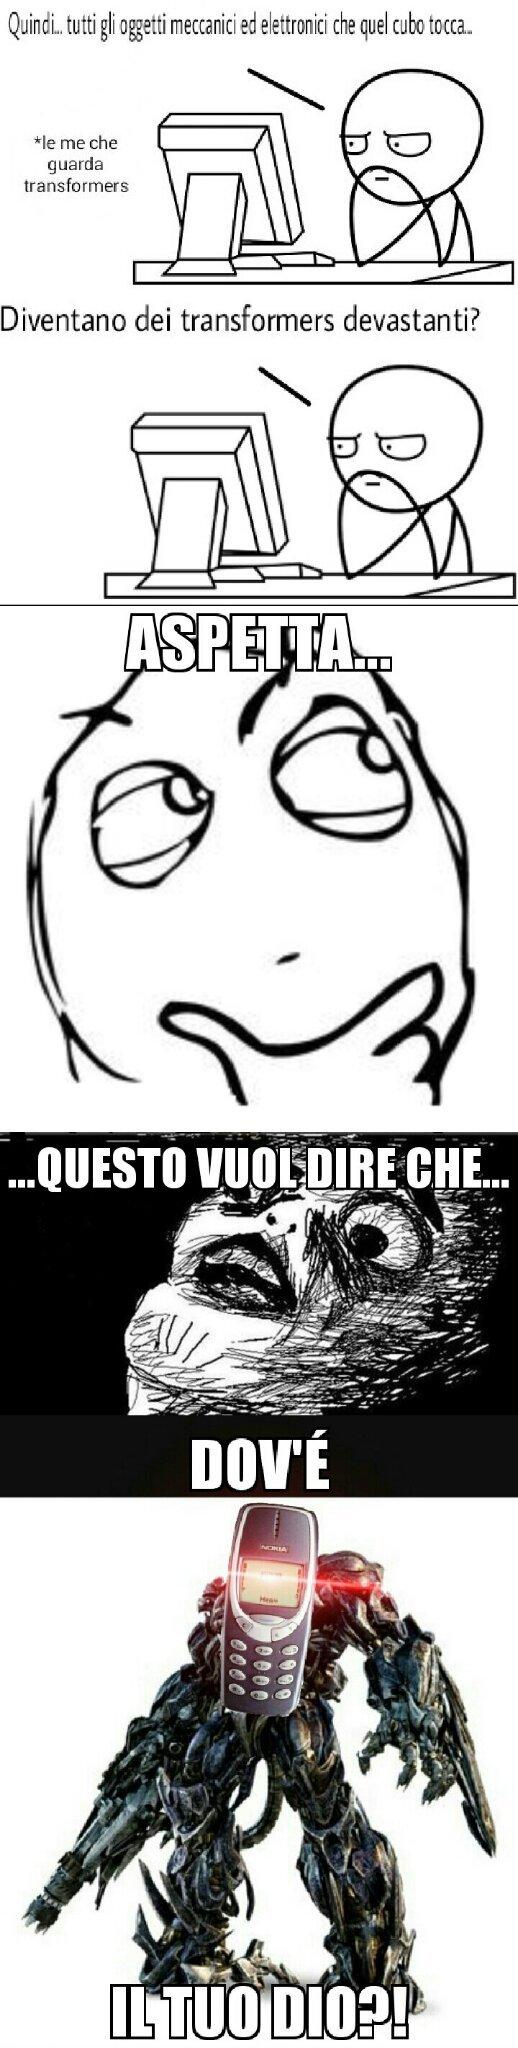 QUALCUNO CHIAMI CHUCK NORRIS! - meme